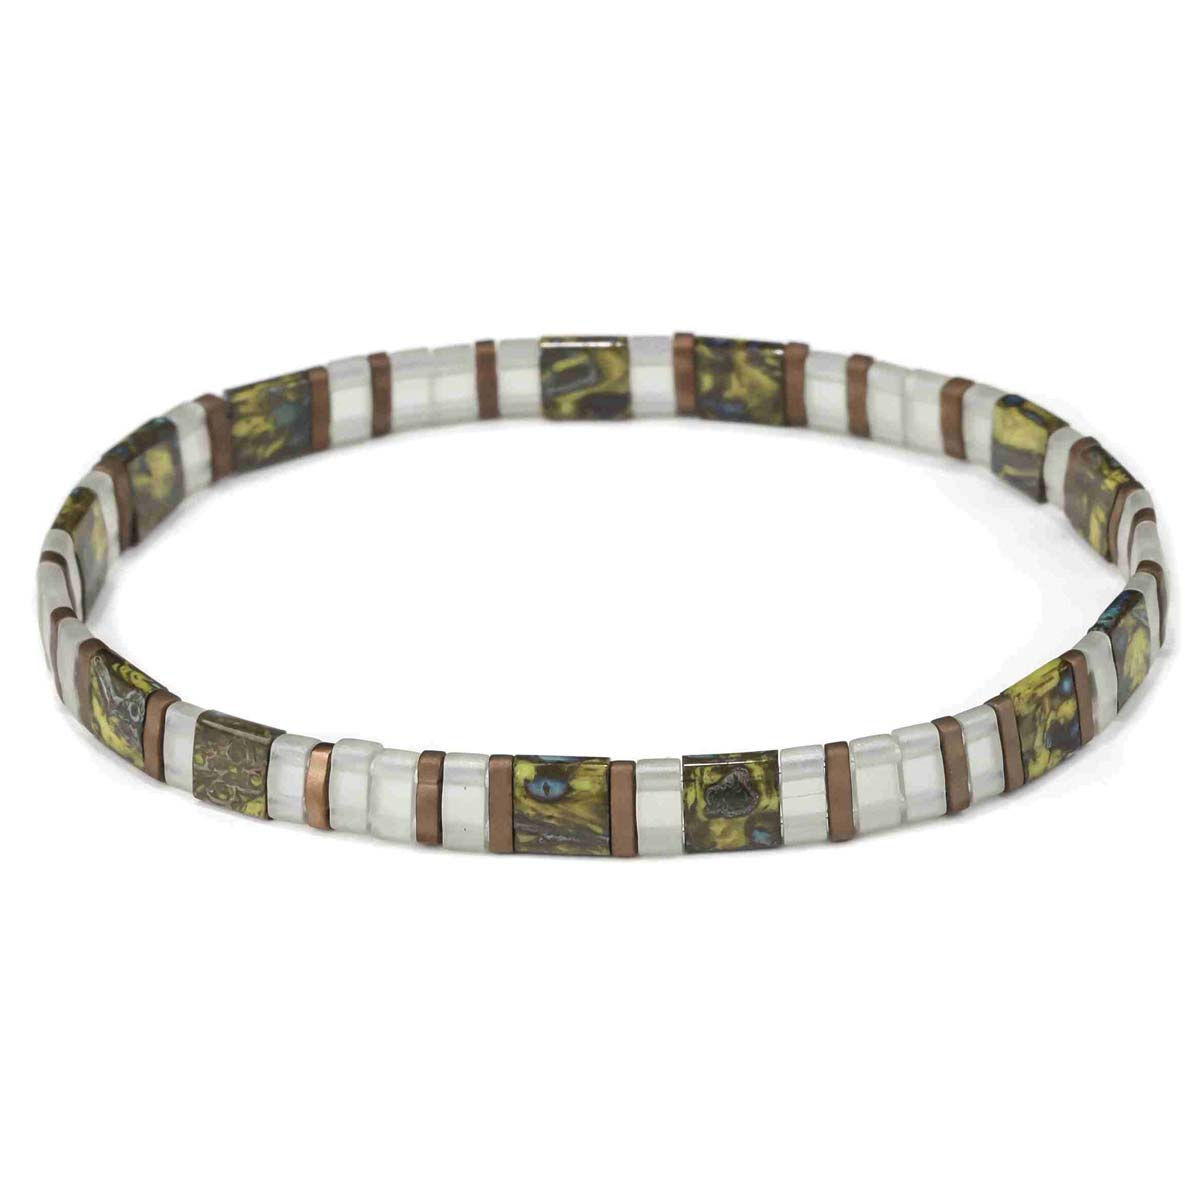 Marbled Green & White Tila Bead Stretch Bracelet